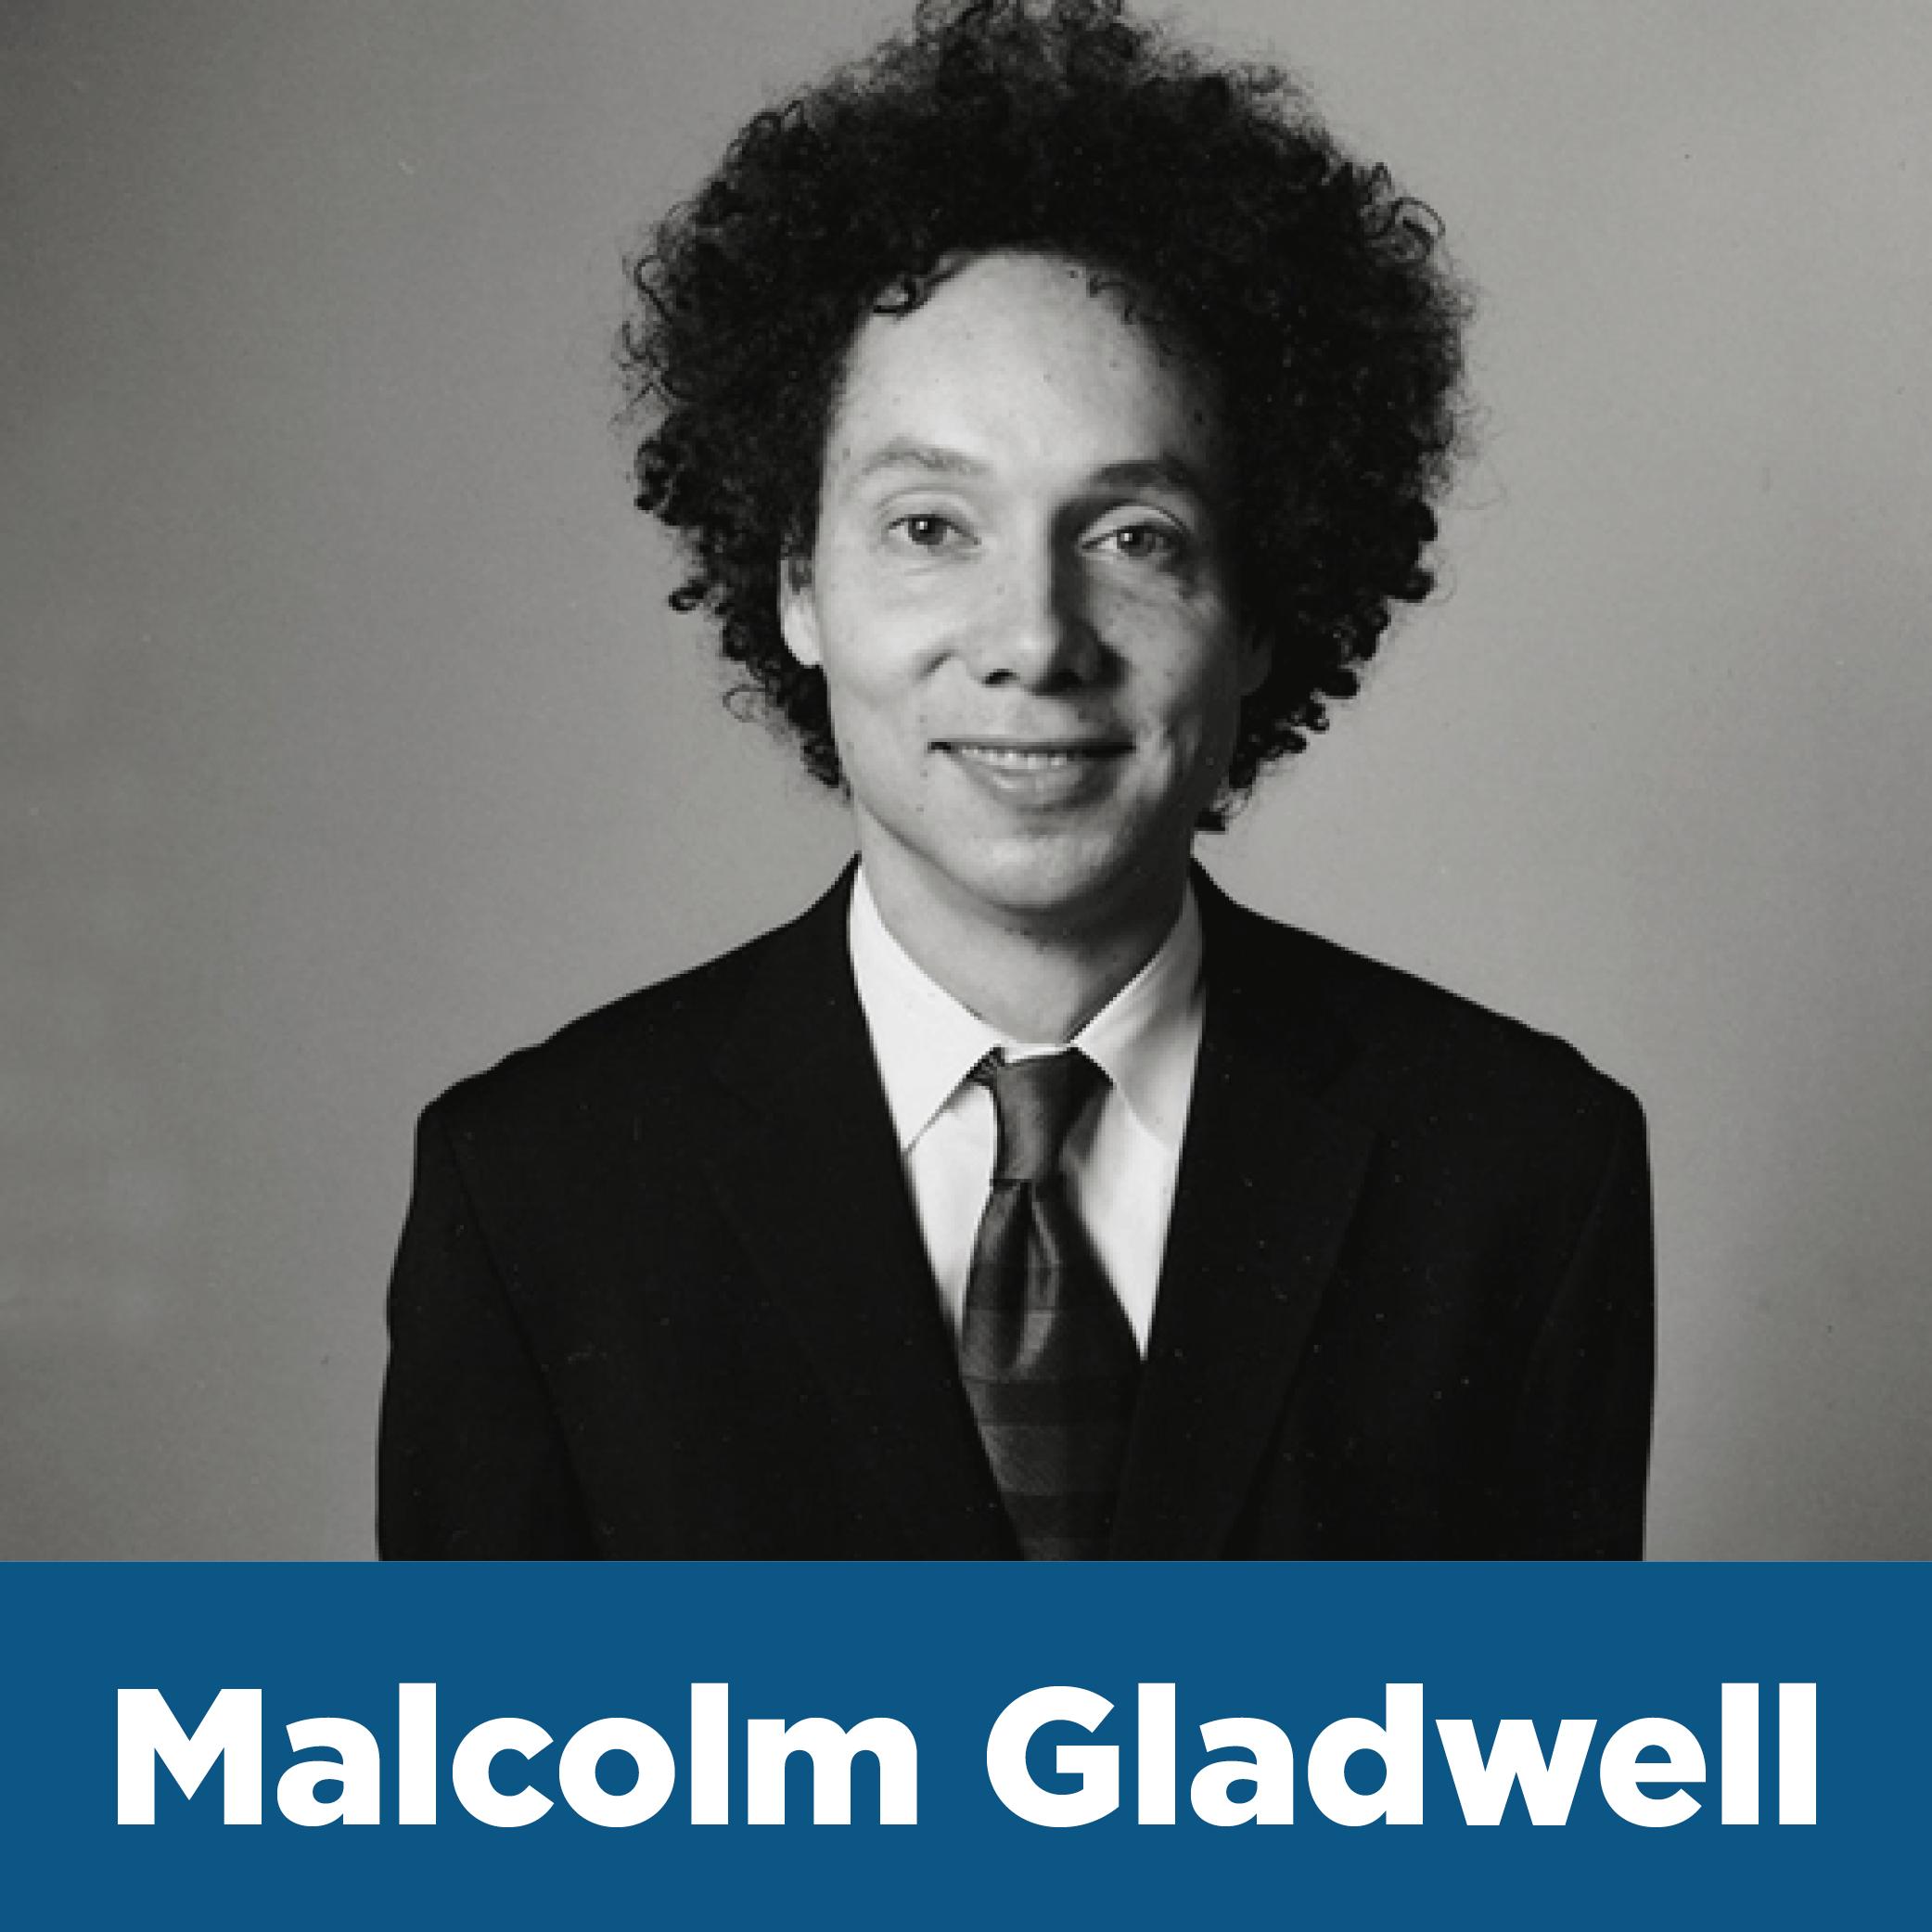 http://www.gladwellbooks.com/